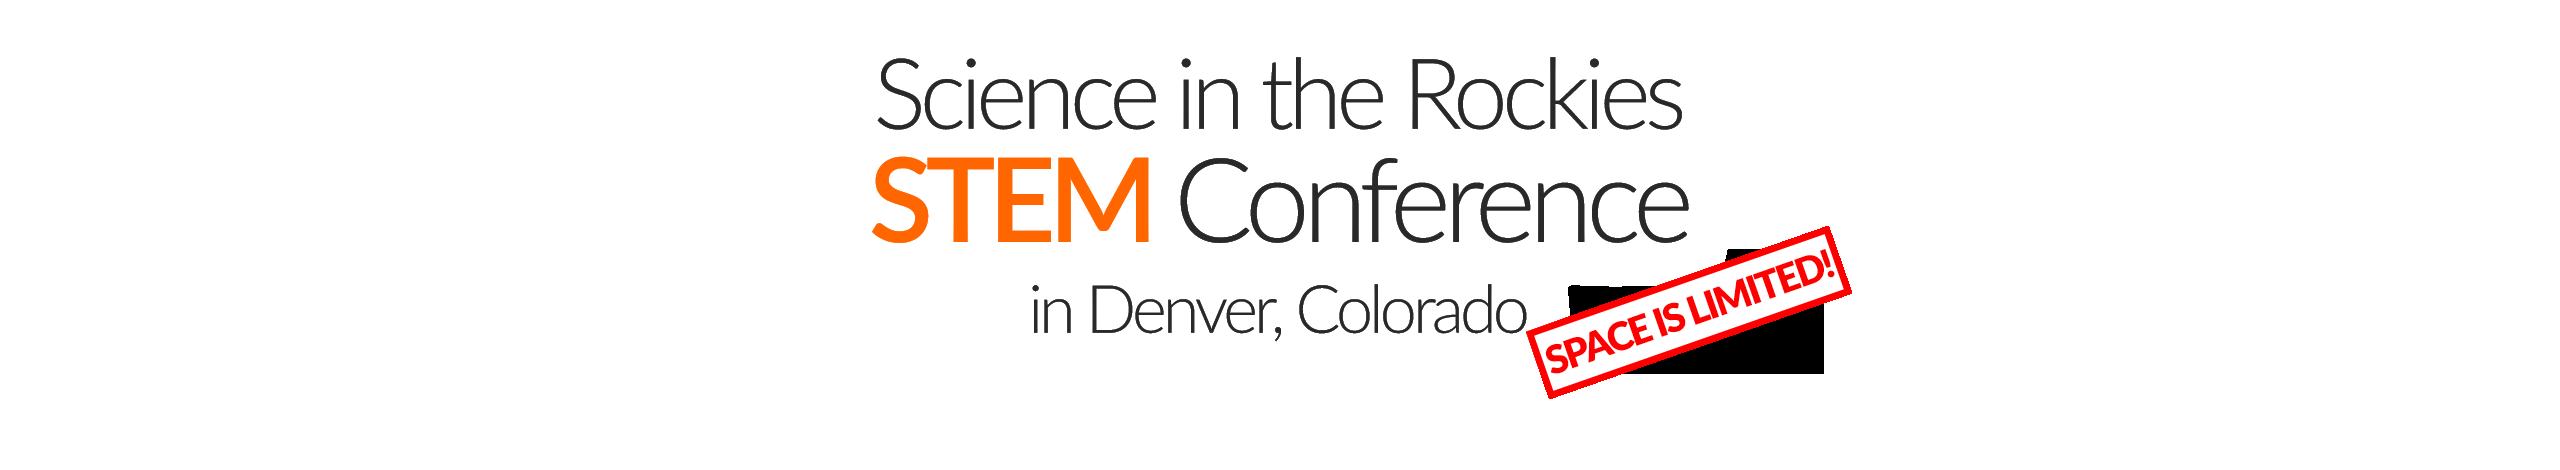 Science in the Rockies 2018 with Steve Spangler in Denver Colorado STEM Conference